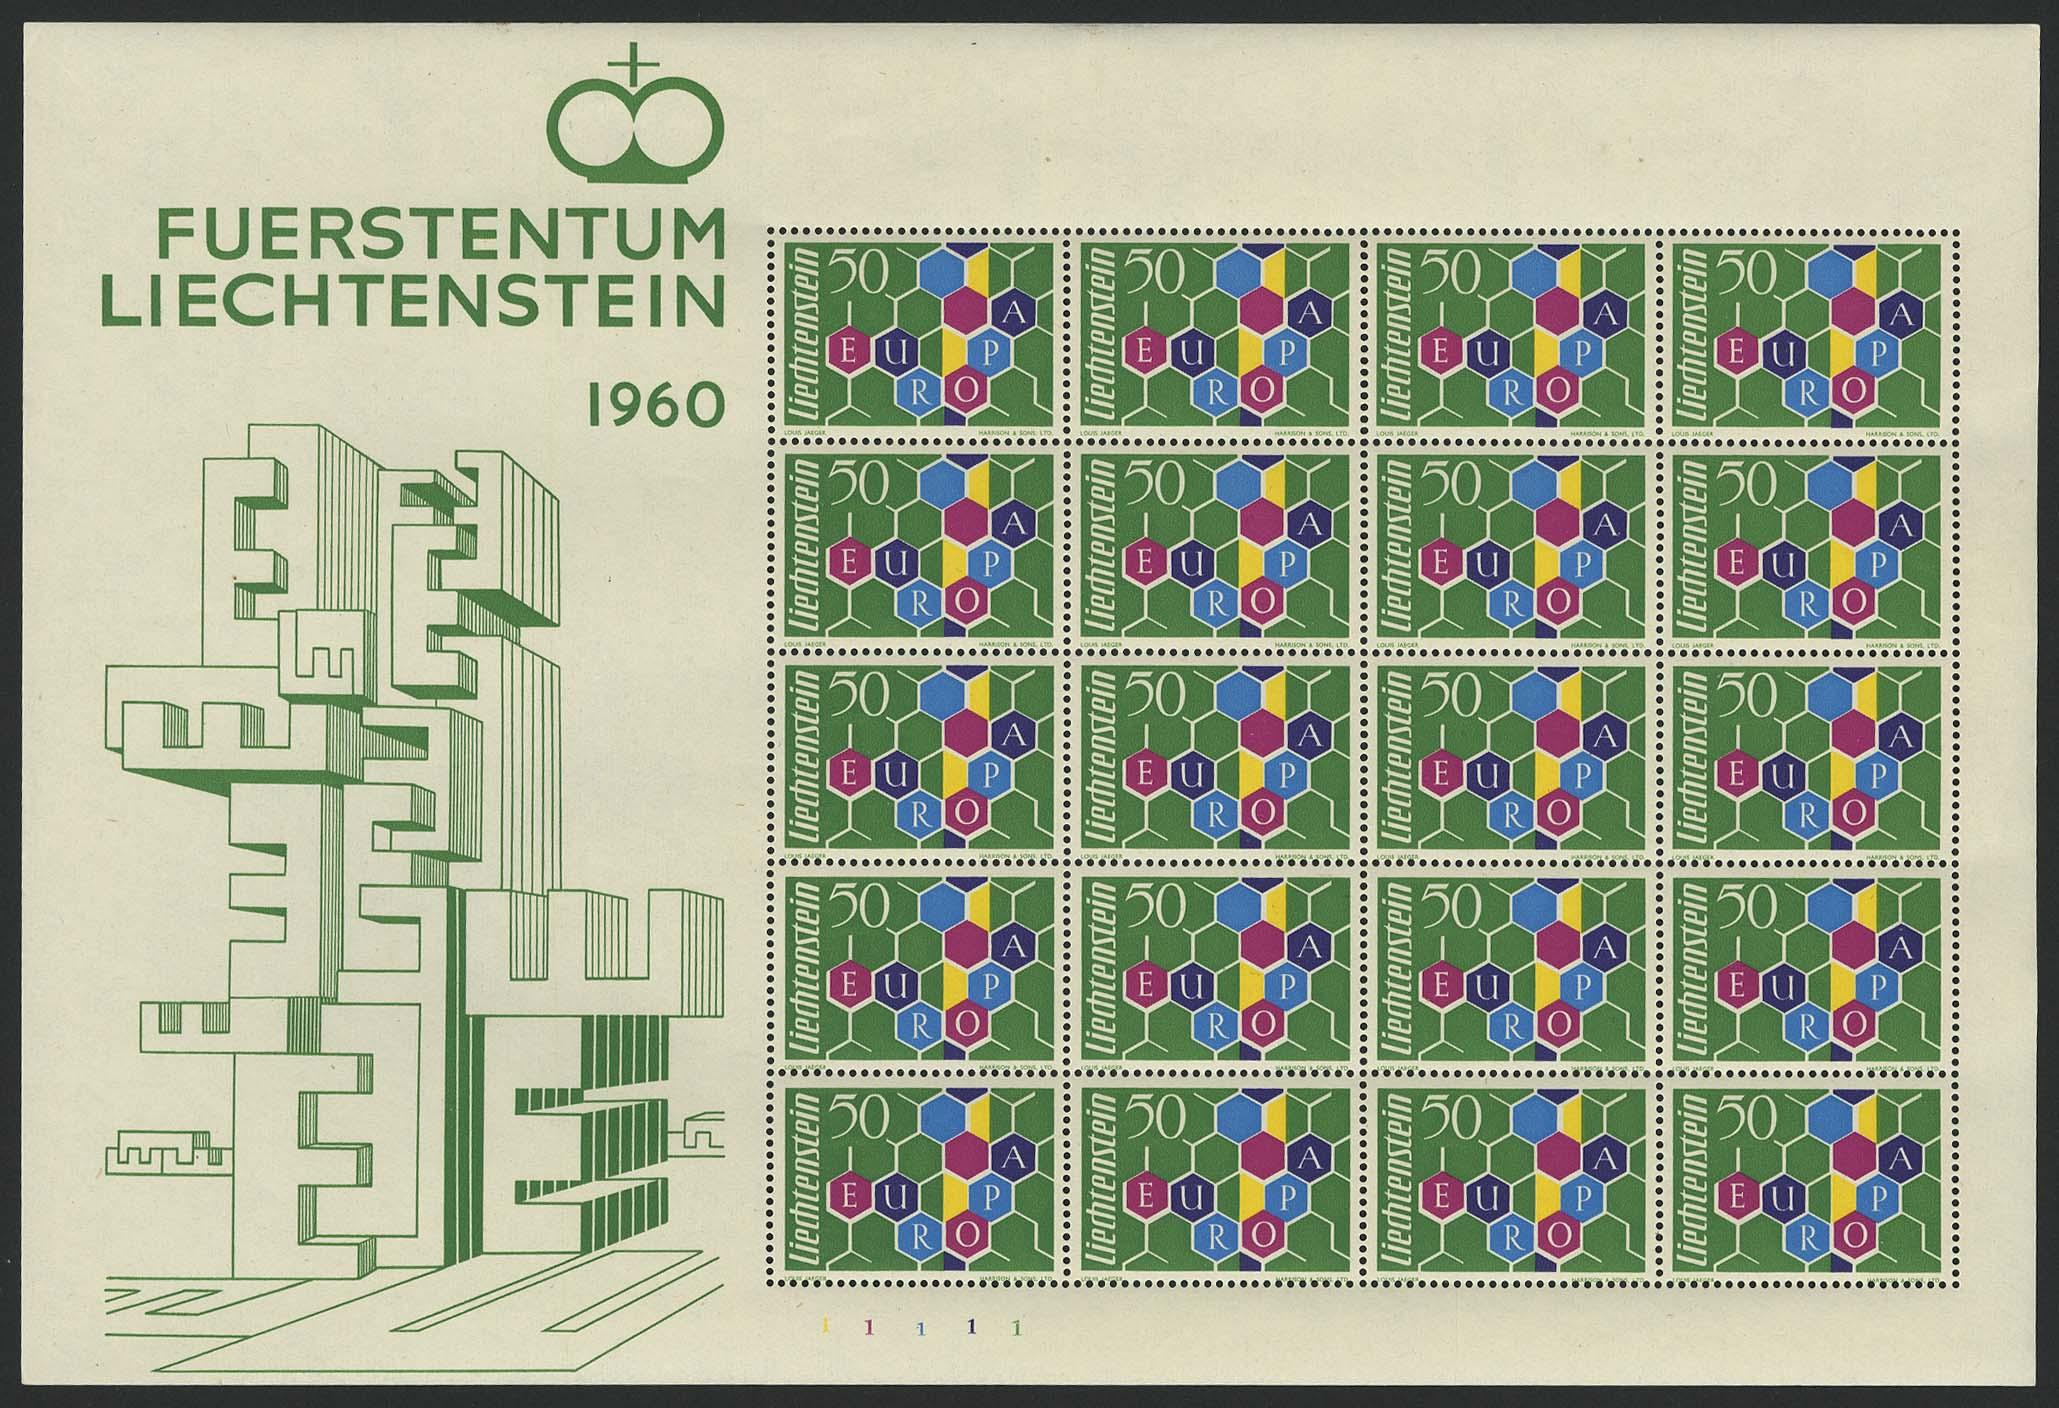 Lot 5249 - Europa A-Z Liechtenstein - Markenausgaben -  Auktionshaus Ulrich Felzmann GmbH & Co. KG